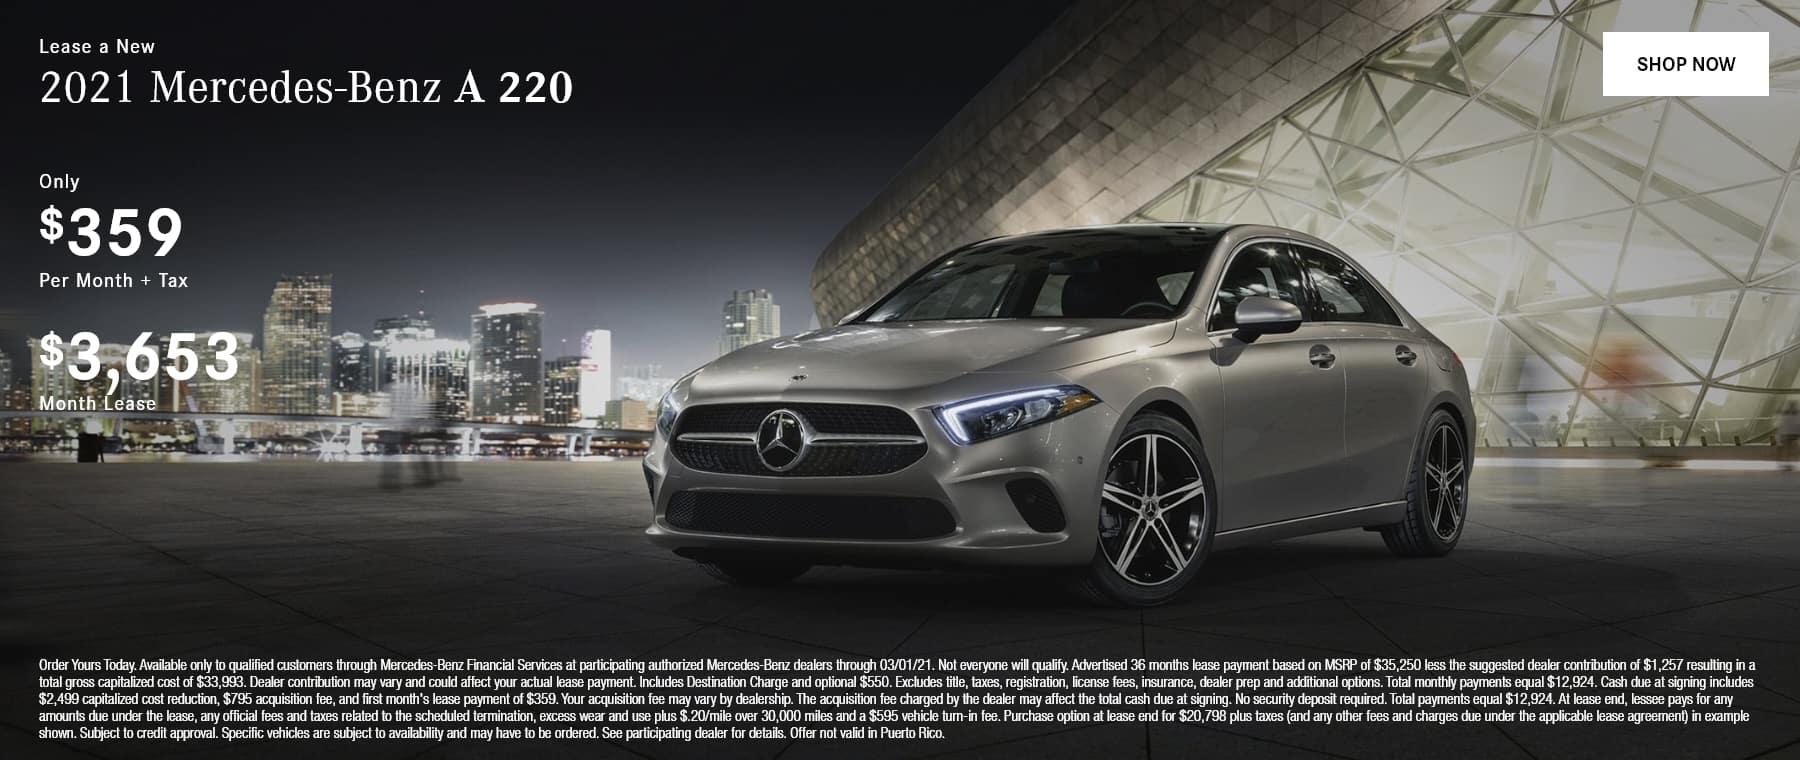 2021 Mercedes-Benz A 220